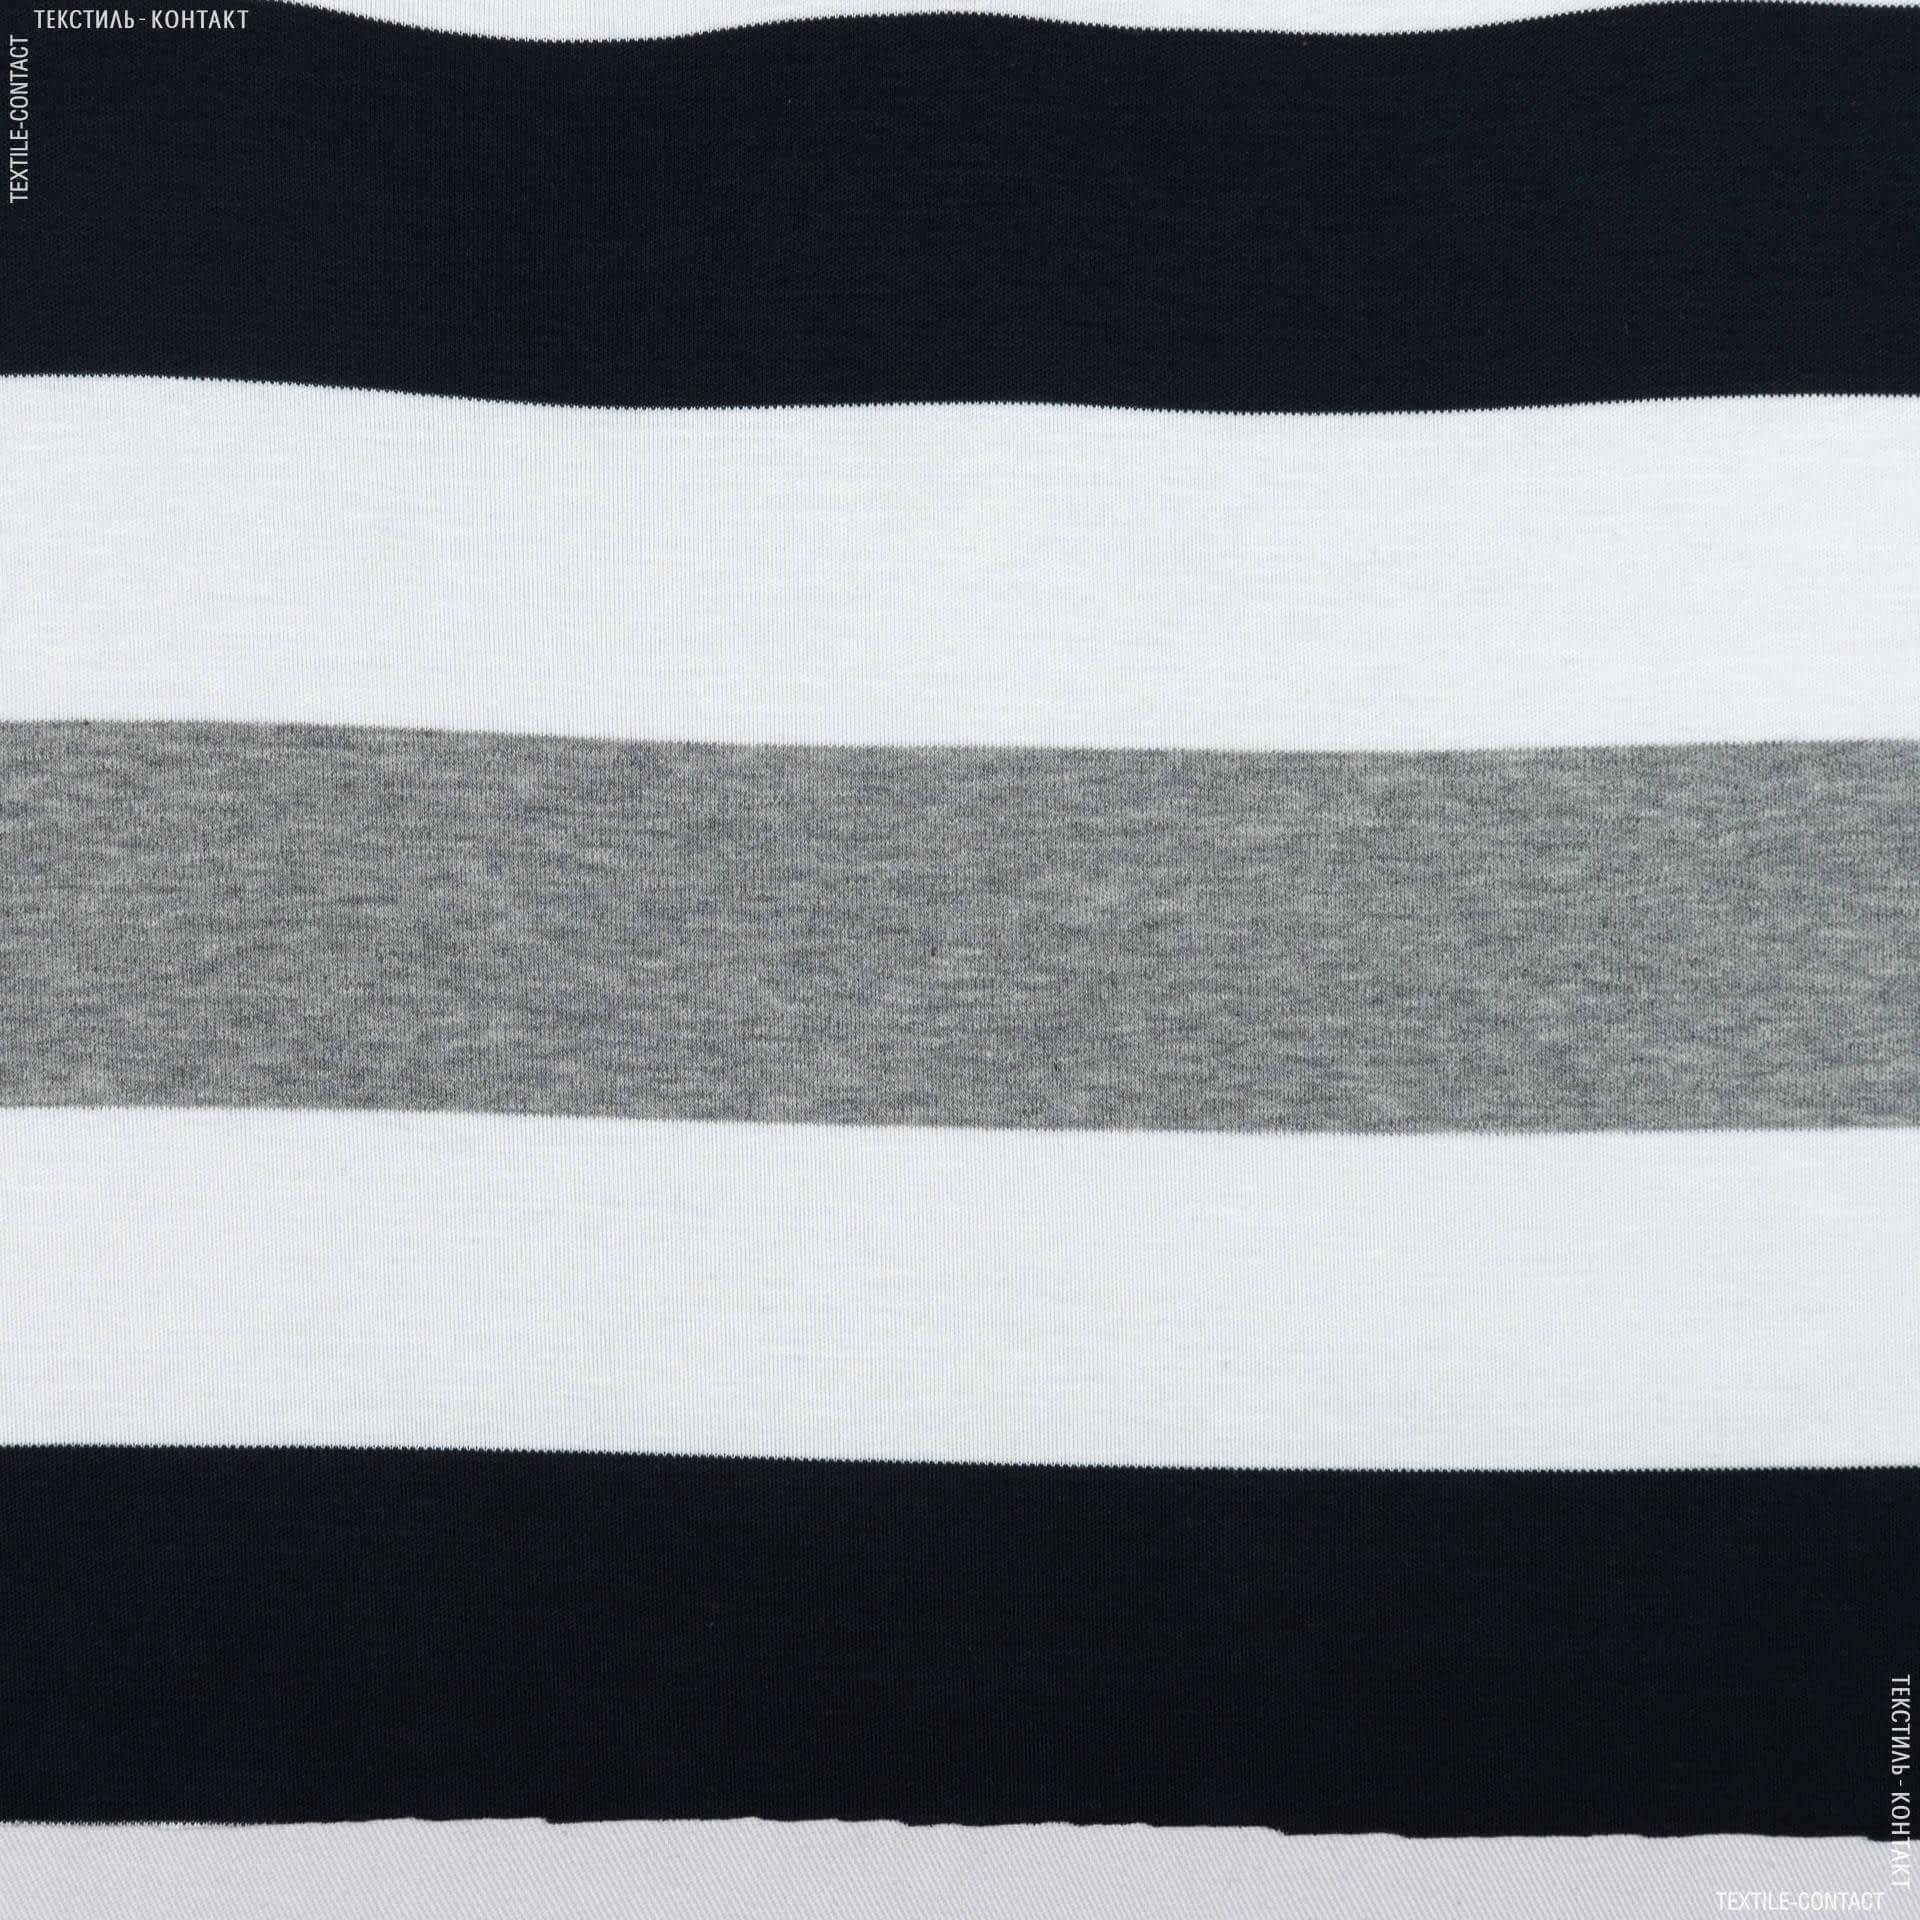 Тканини для суконь - Трикотаж у смужку